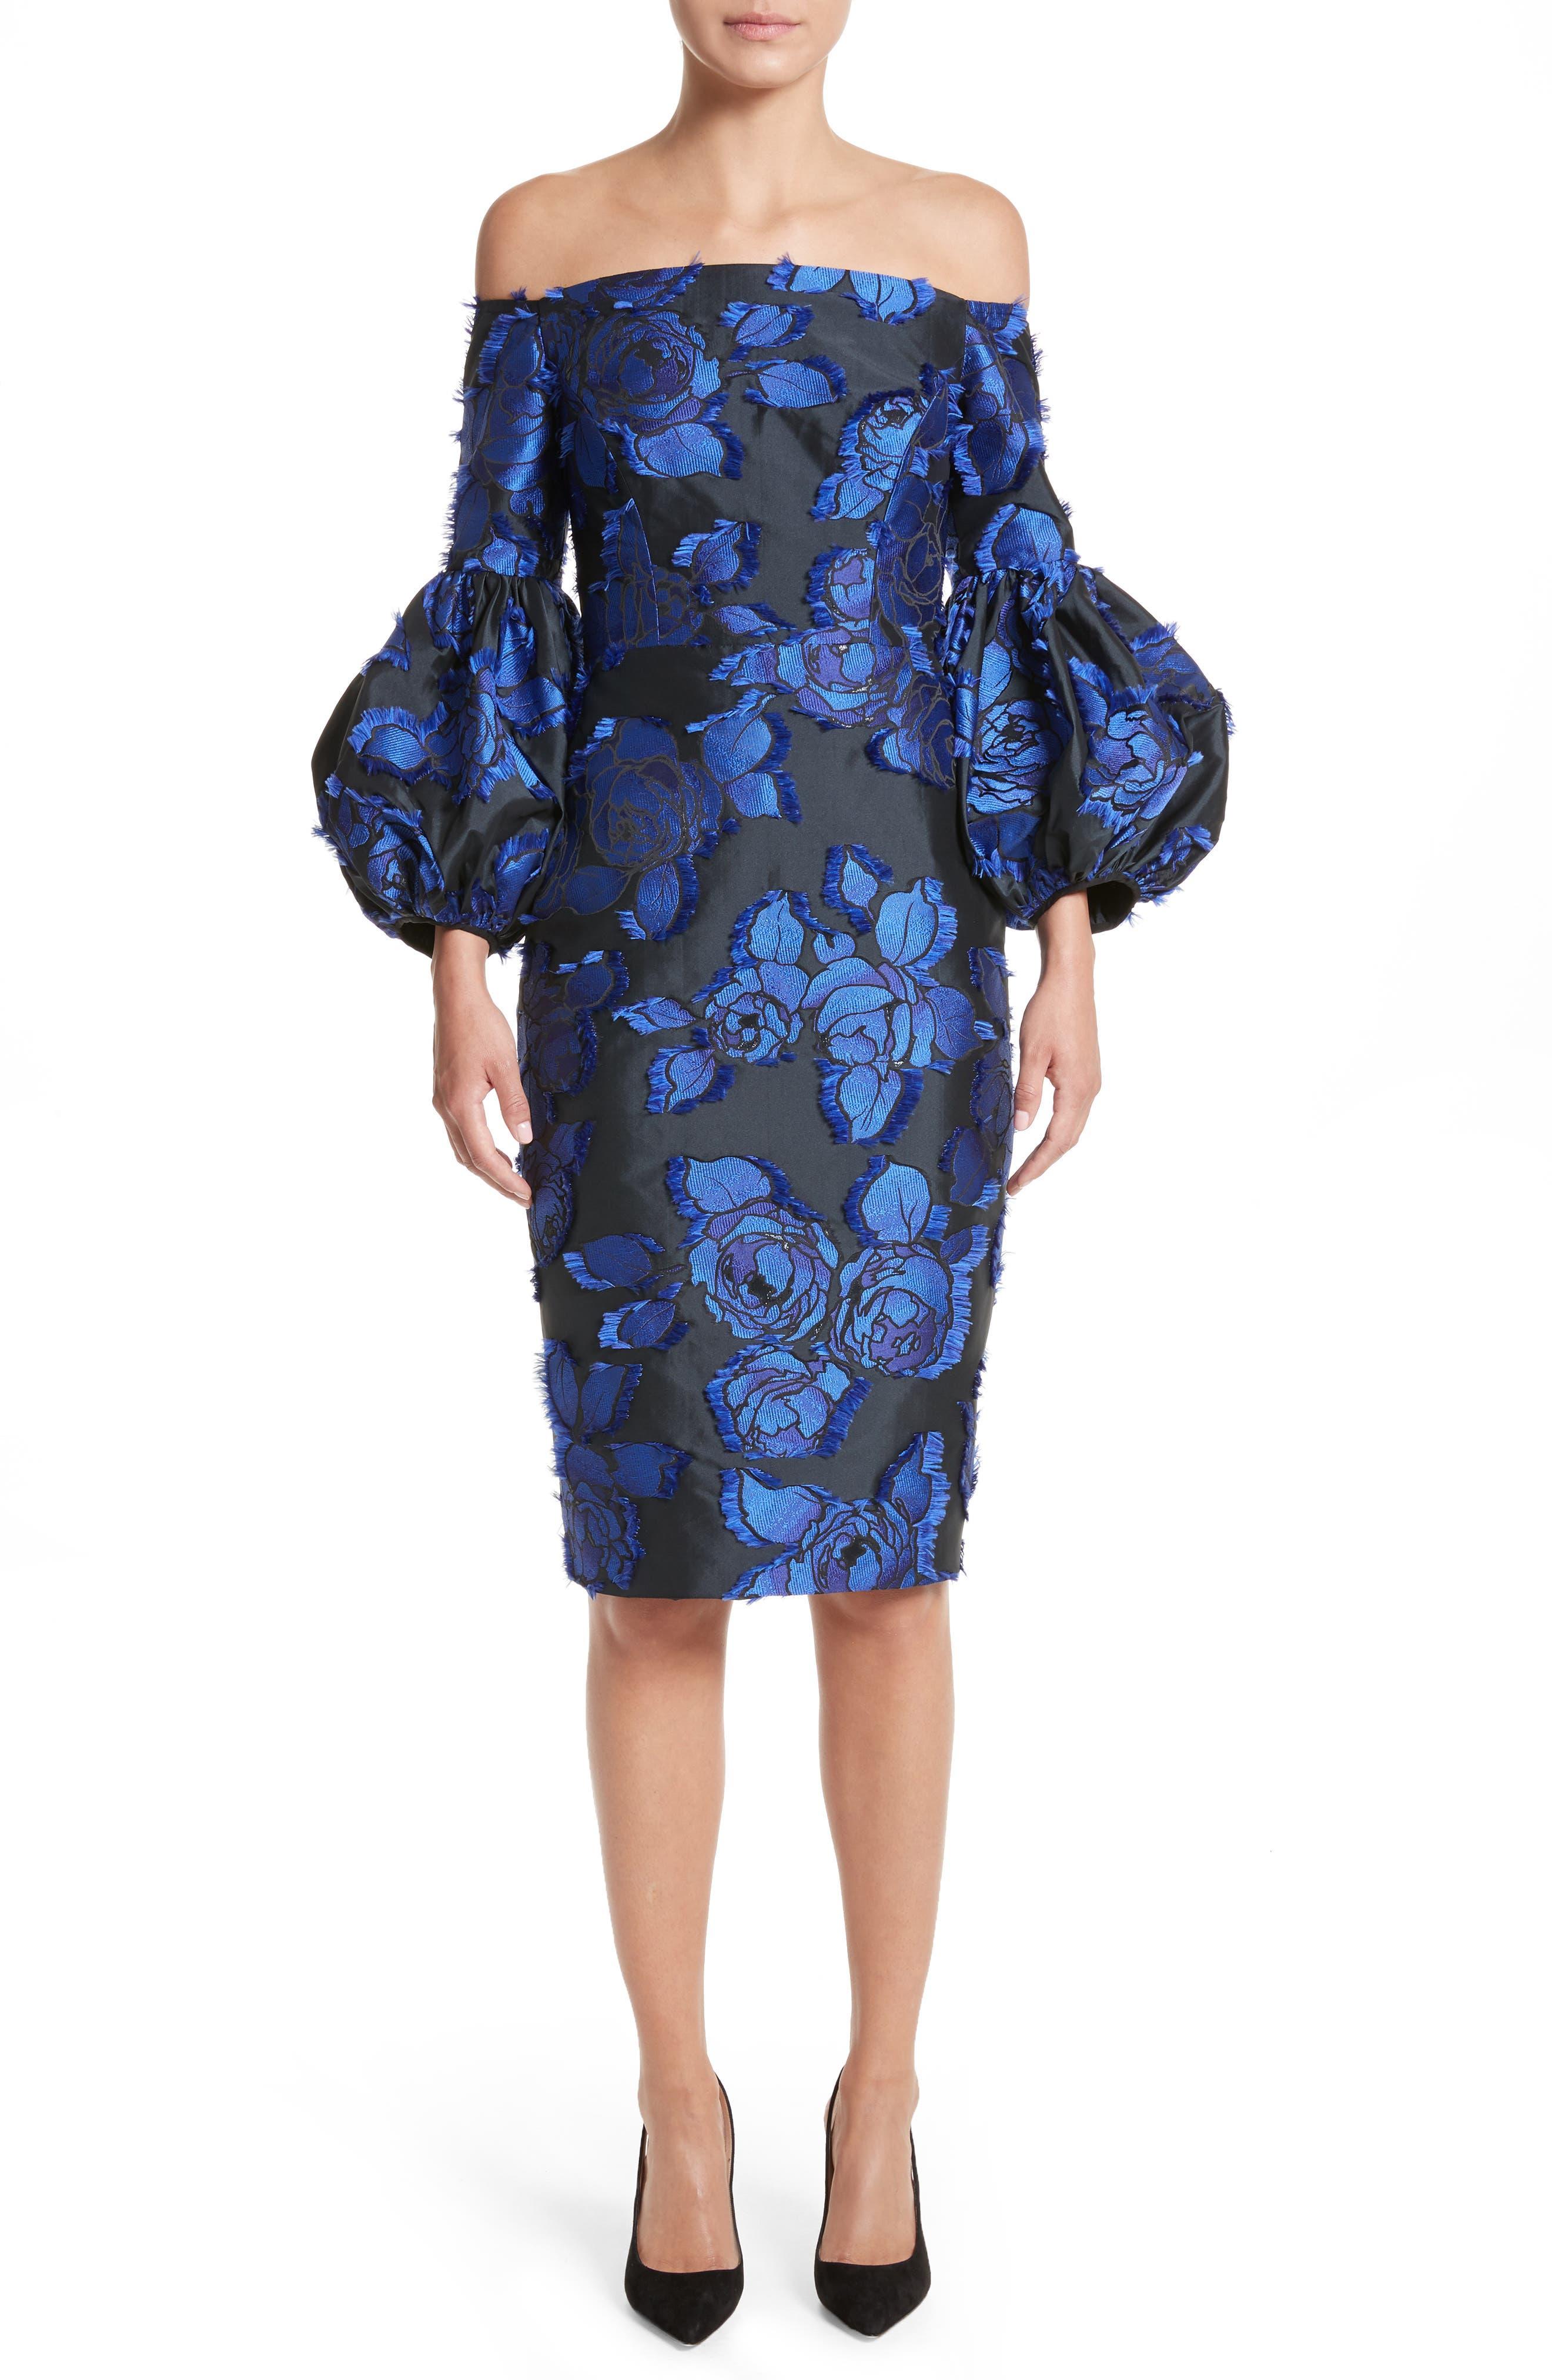 Fring Brocade Puff Sleeve Dress,                         Main,                         color, 001